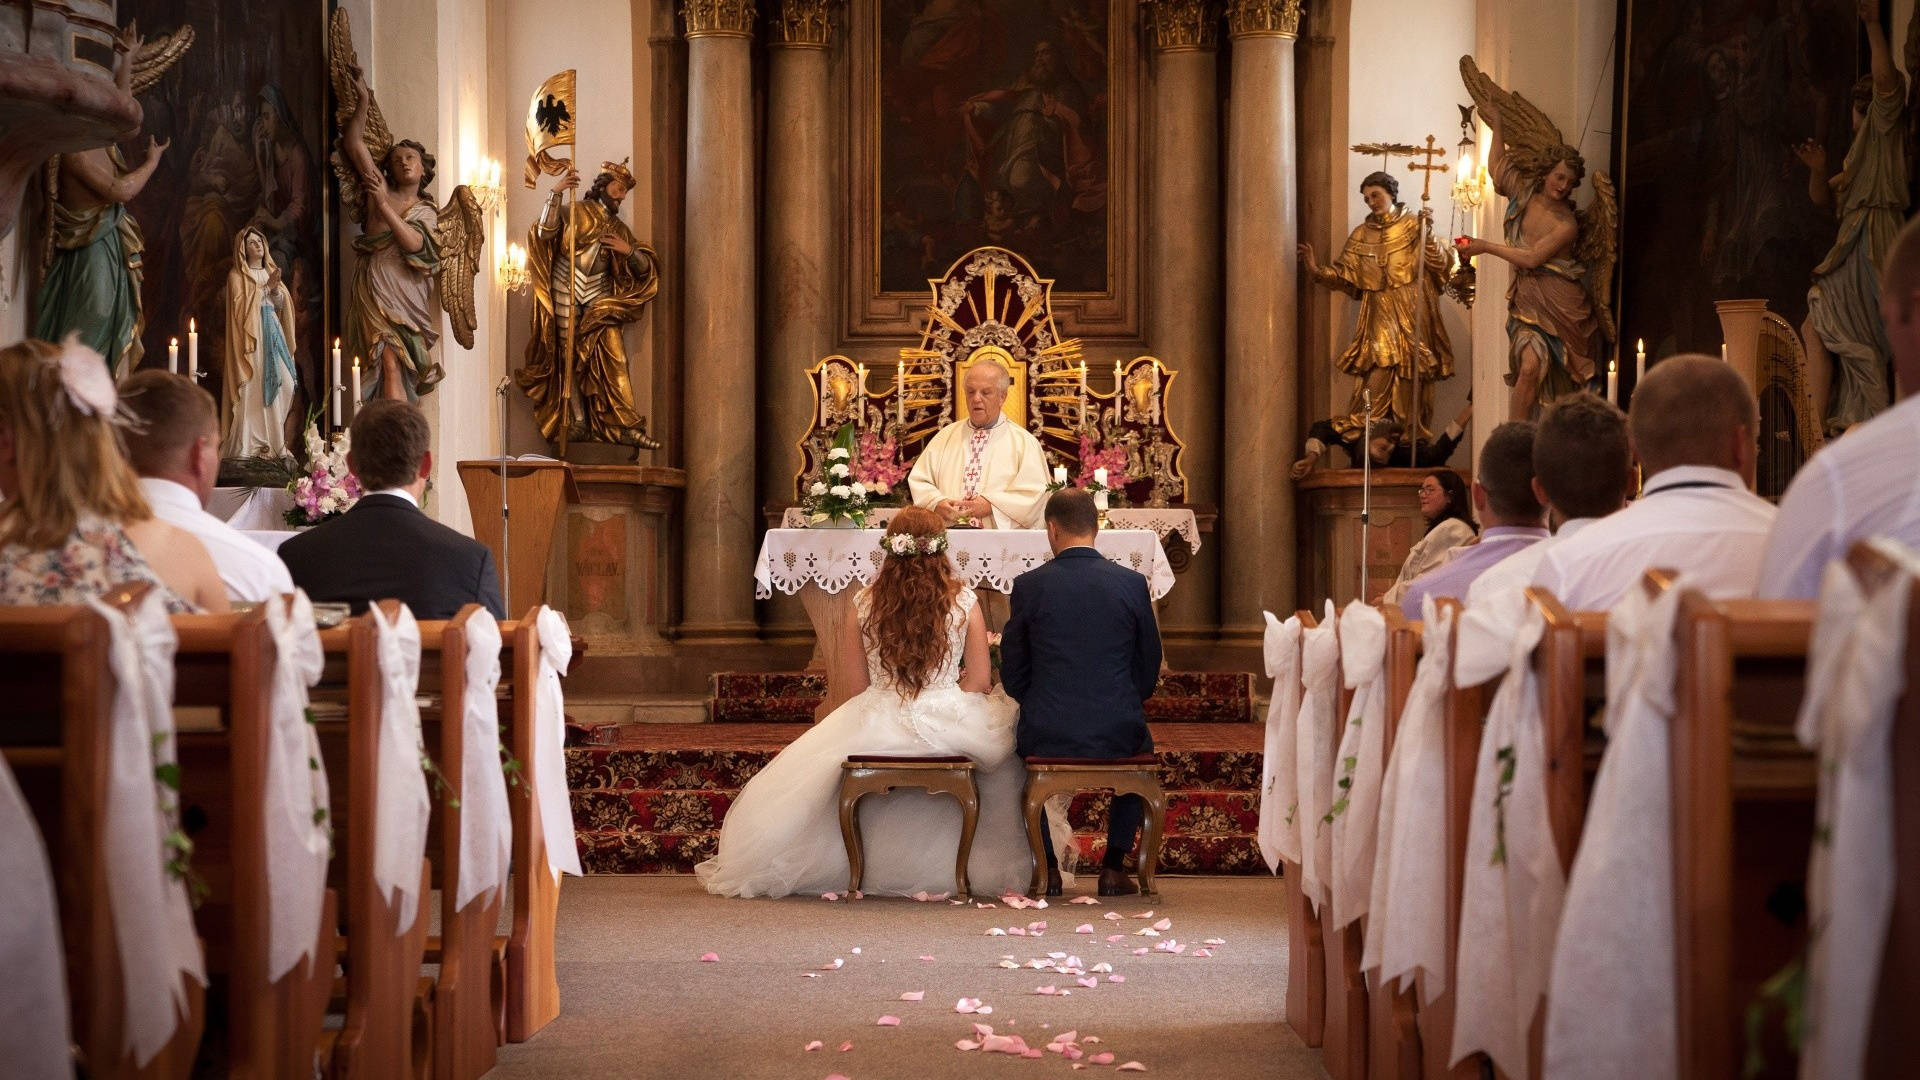 Svatba v kostele, fotovalek.cz